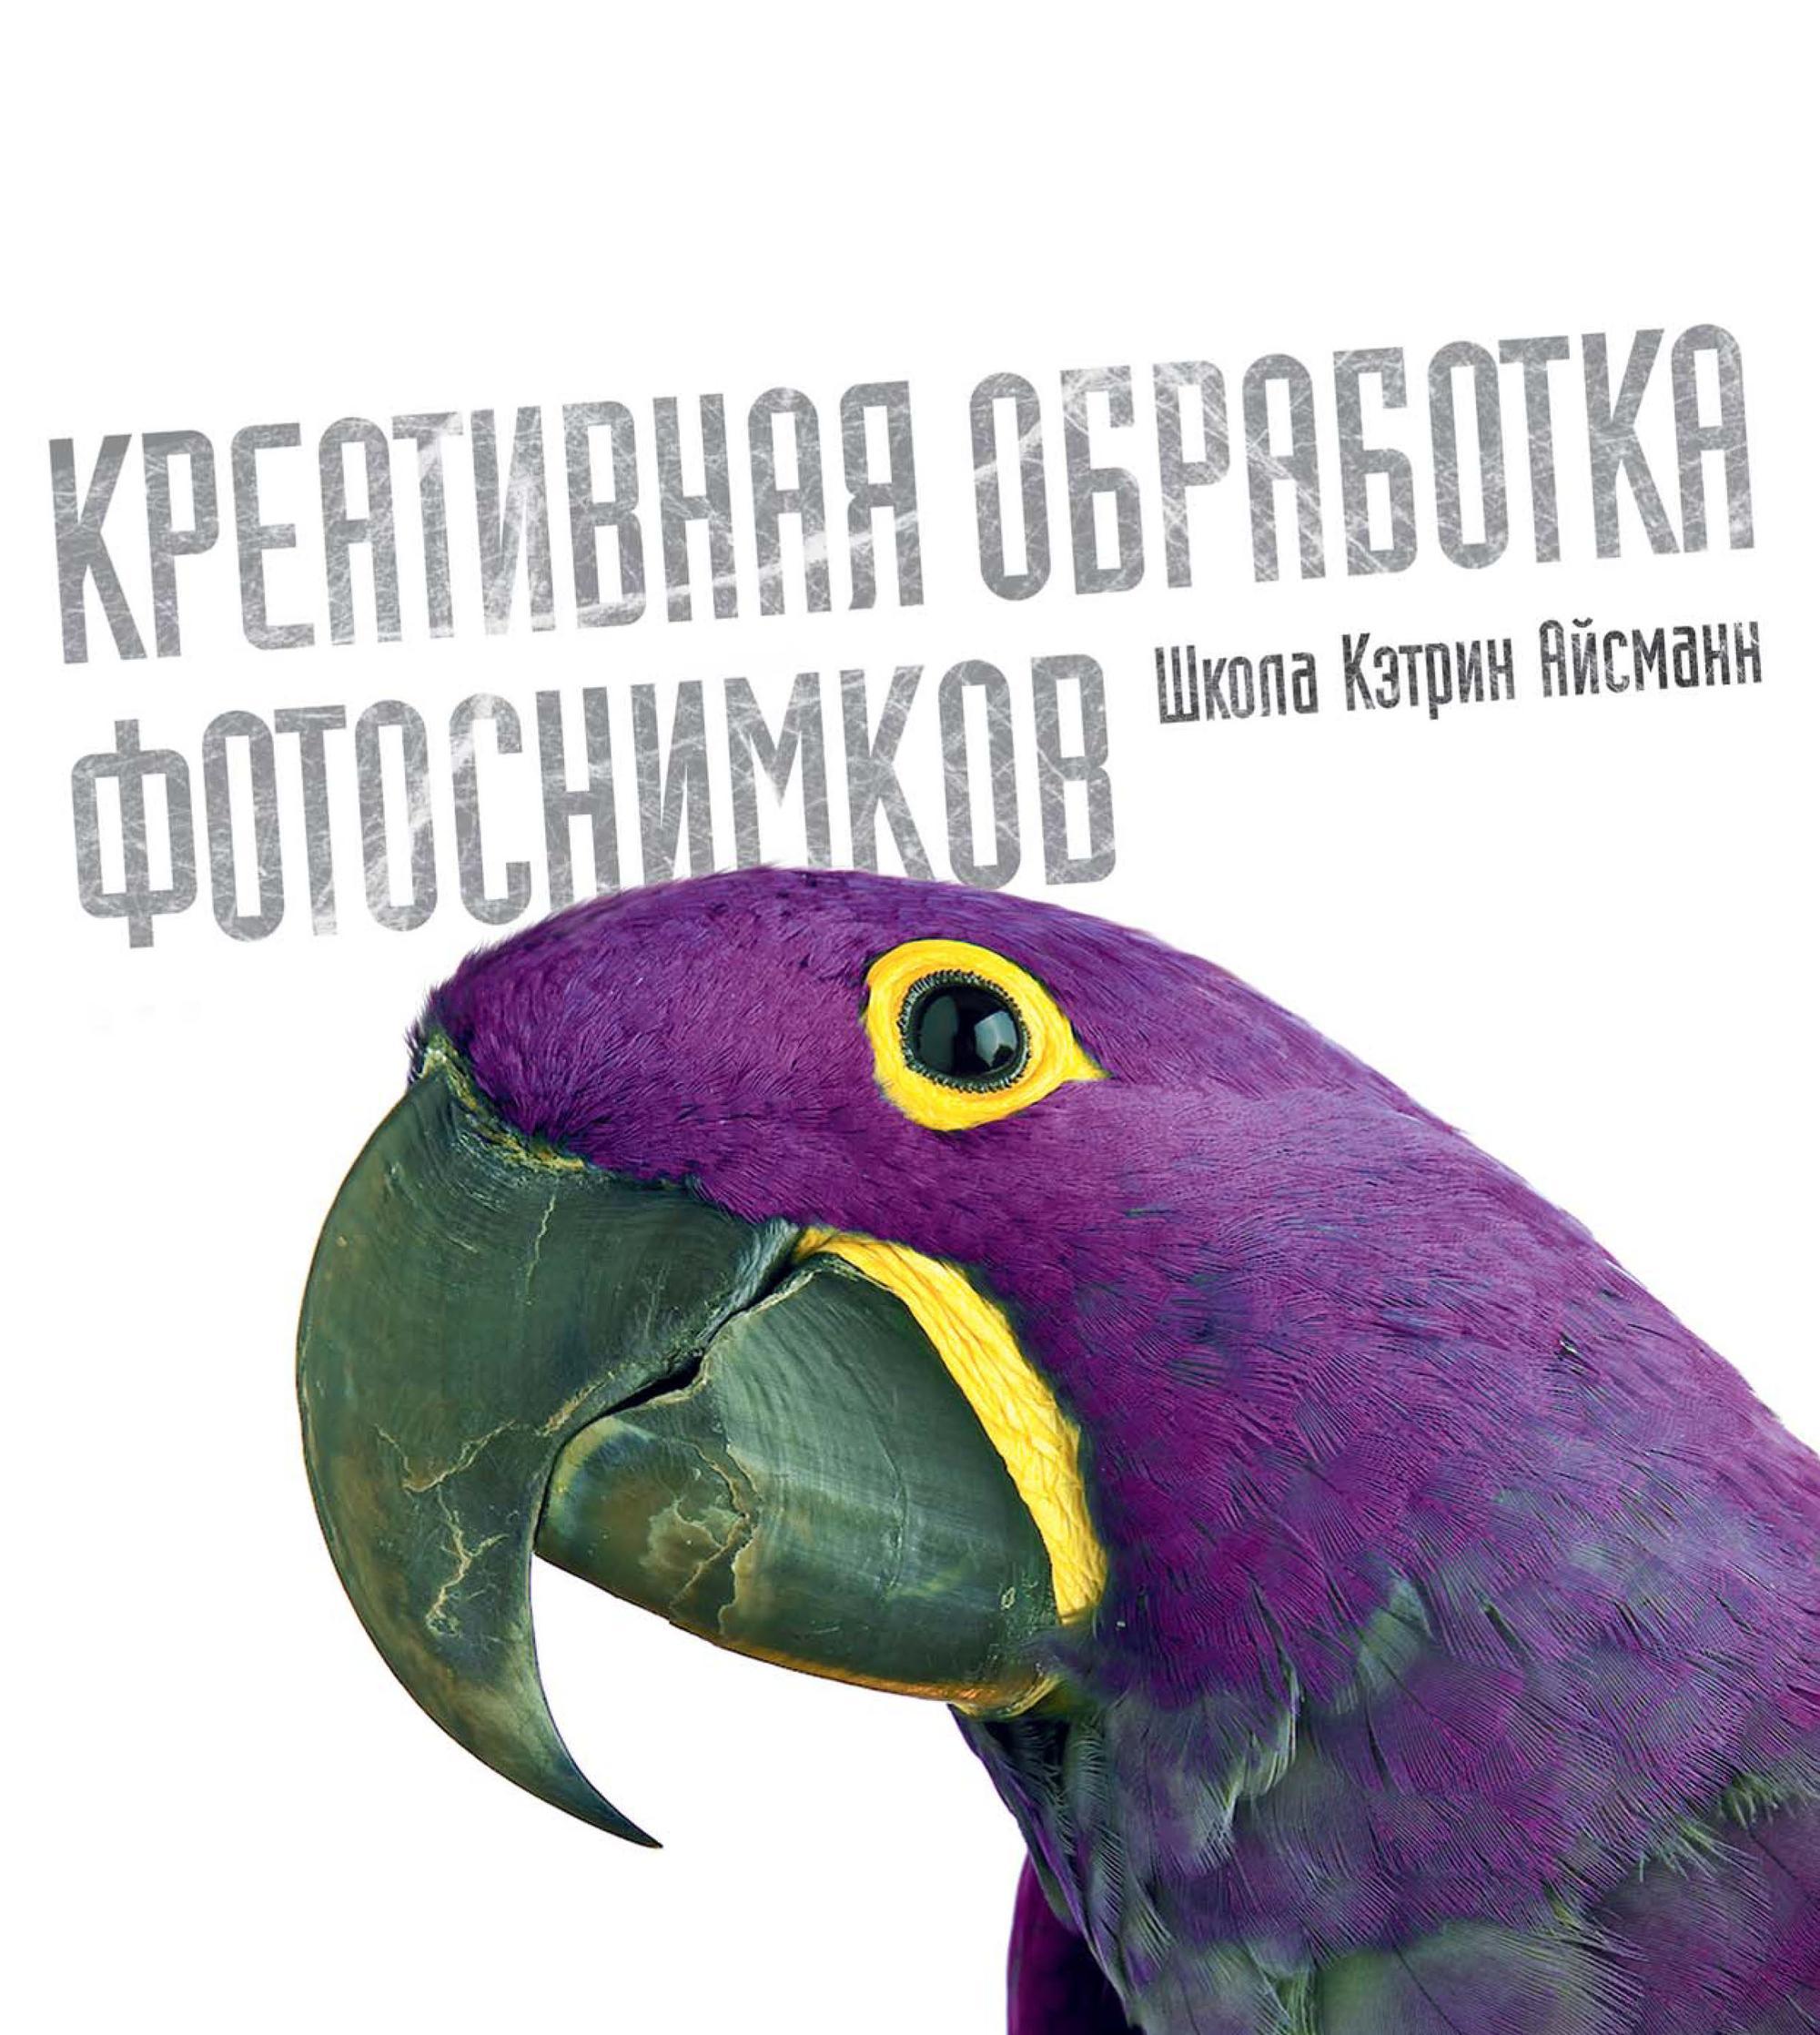 Кэтрин Айсманн, Шон Дагган «Креативная обработка фотоснимков. Школа Кэтрин Айсманн»